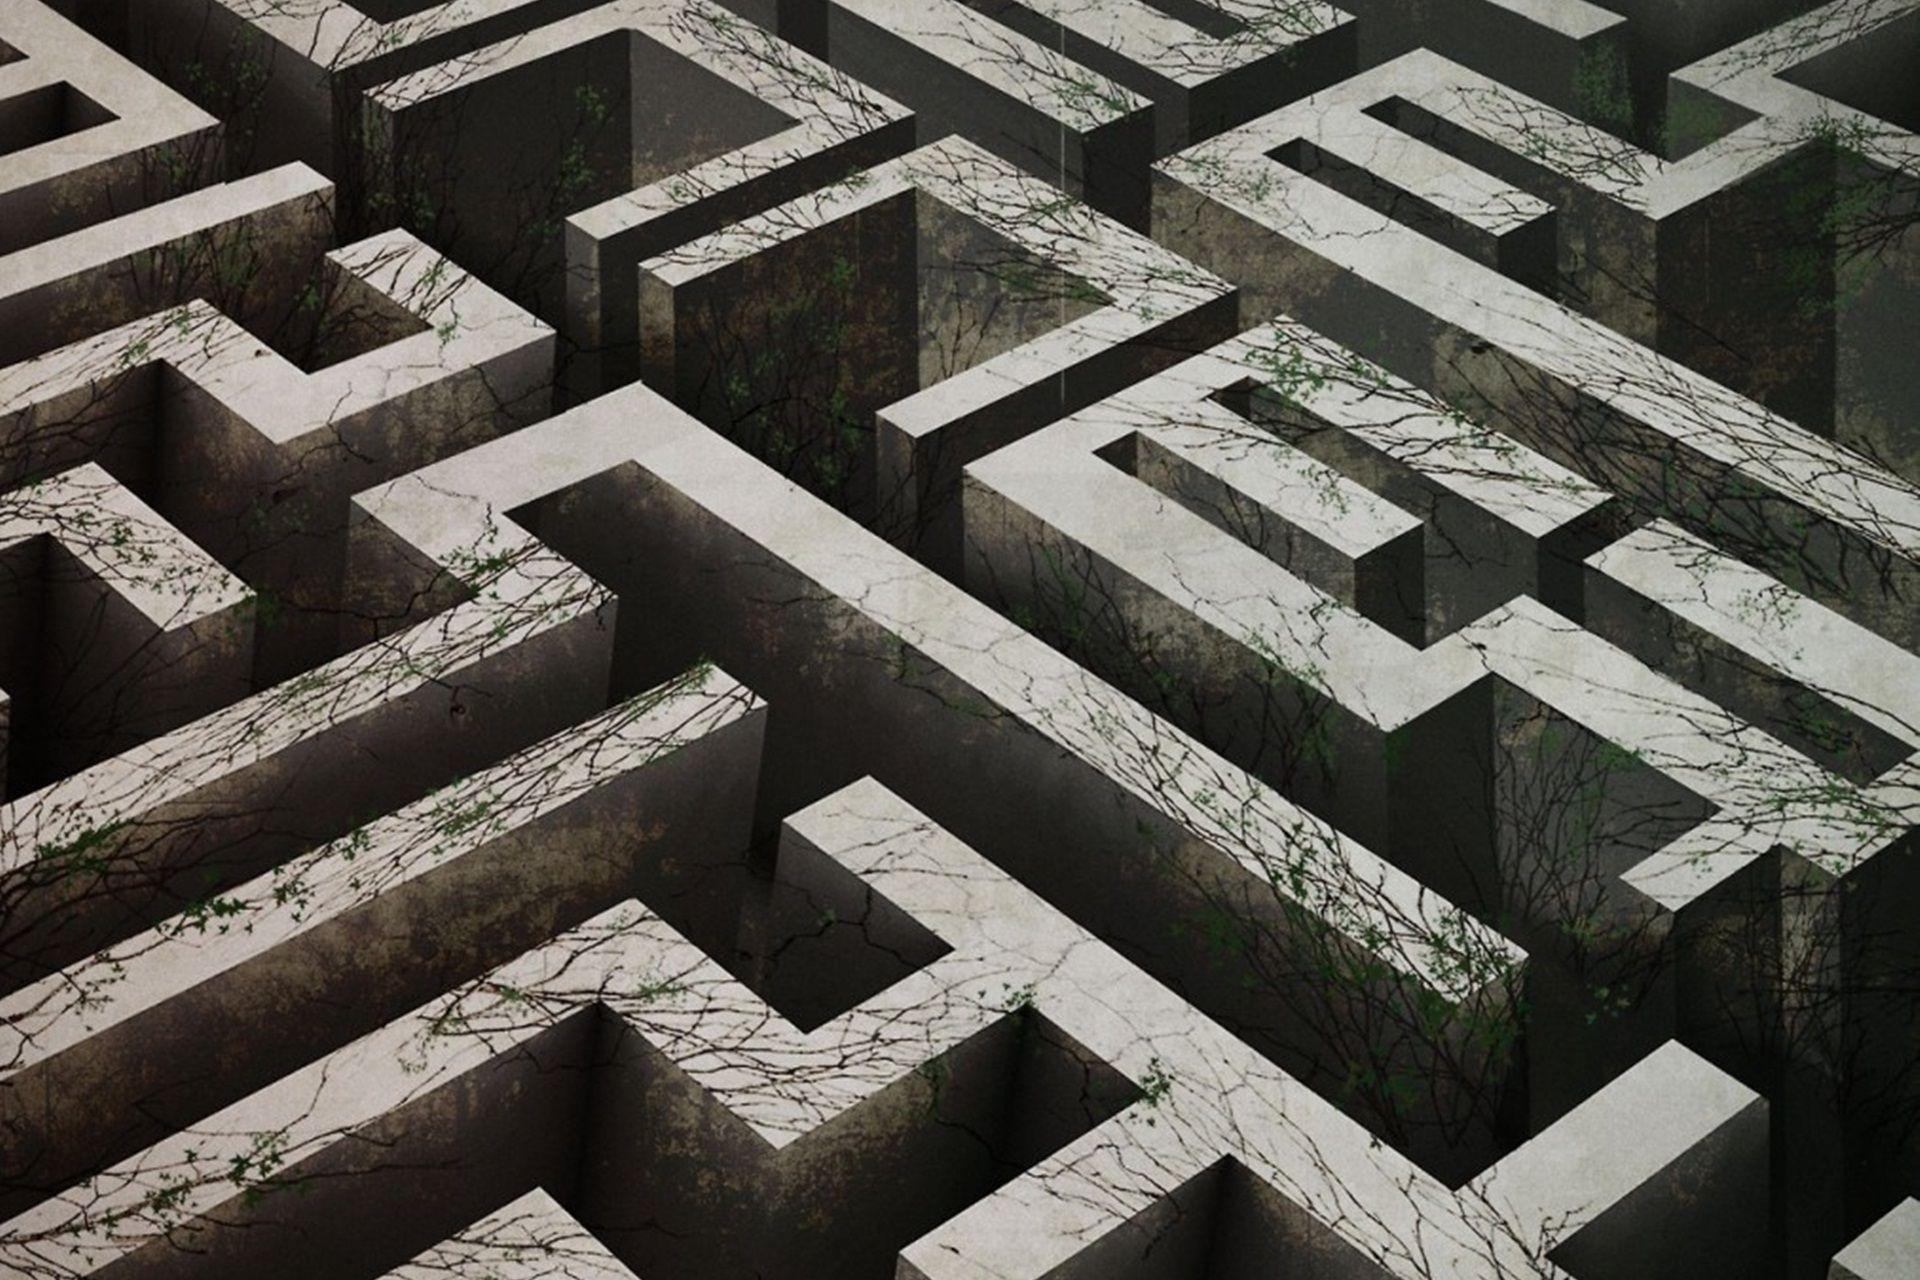 Maze Game v2